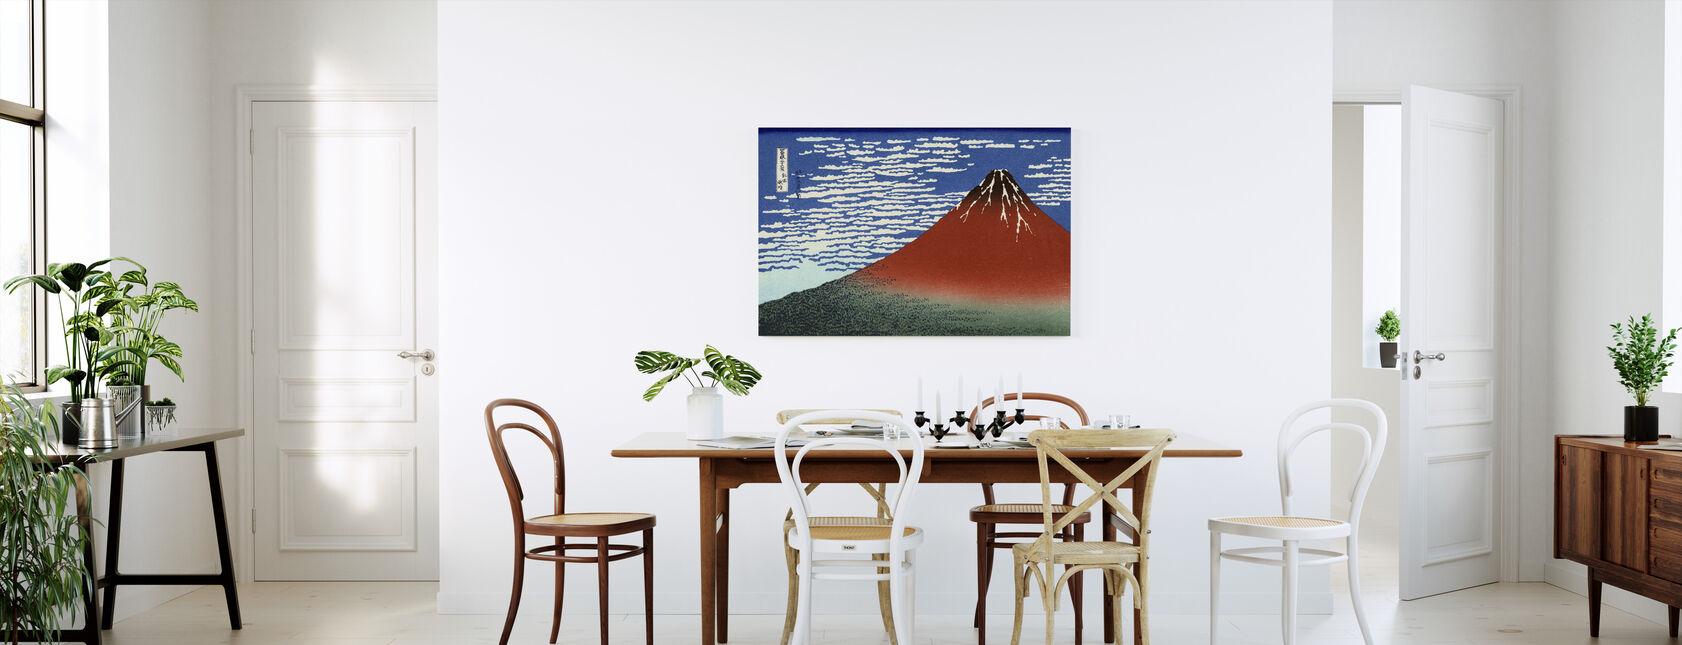 Red Fuji, Katsushika Hokusai - Canvas print - Kitchen